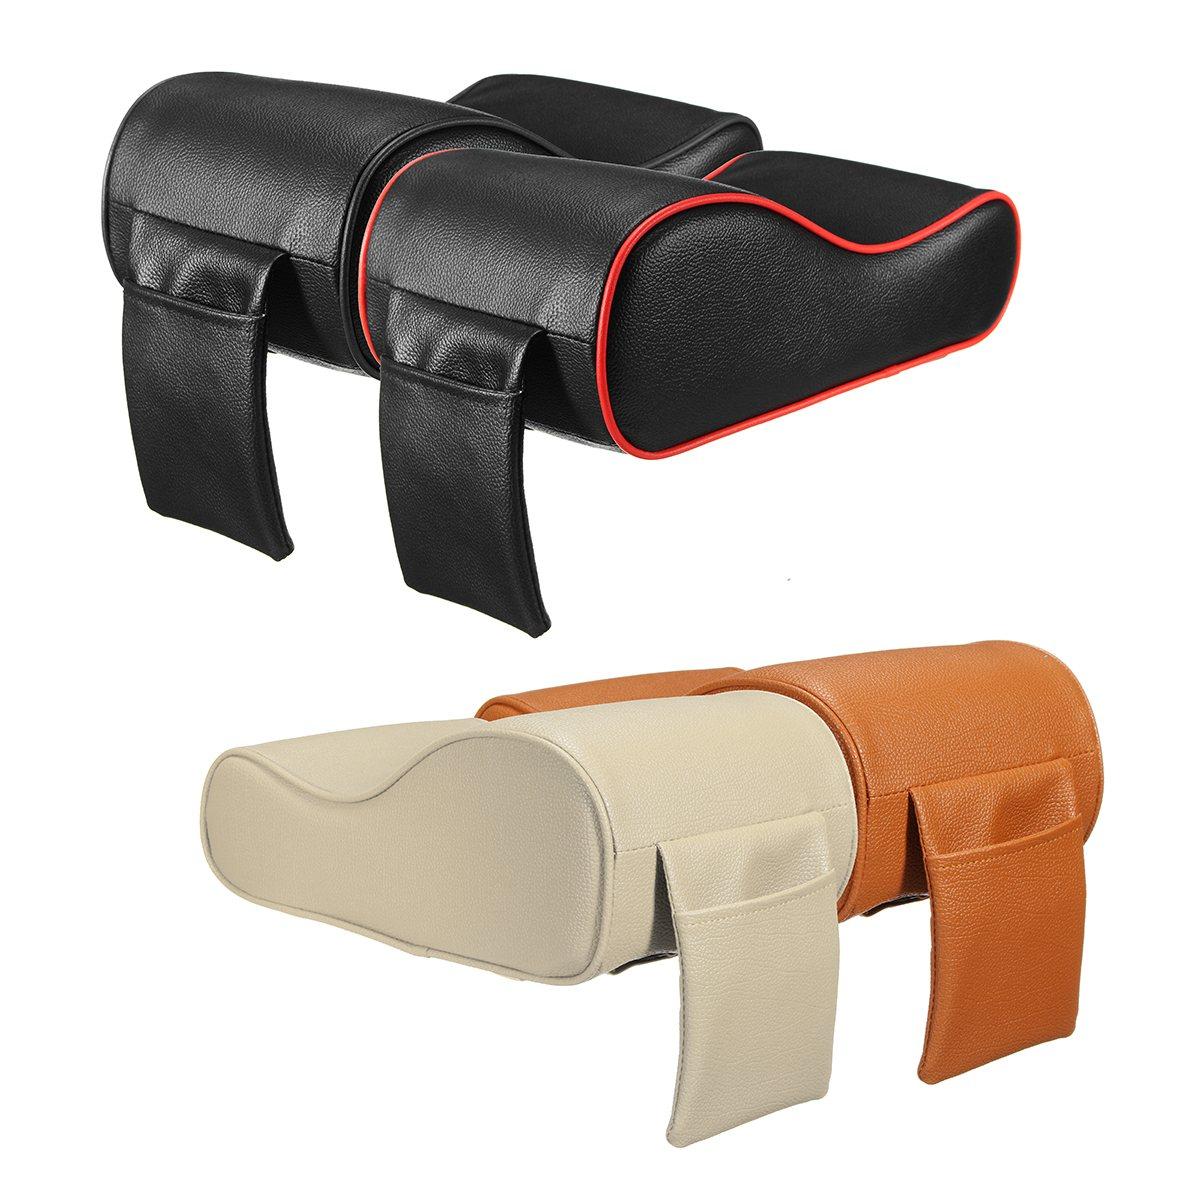 Luxury PU Leather Car SUV Center Box Armrest Cushion Console Soft Pad Cushion Cover Mat Memory